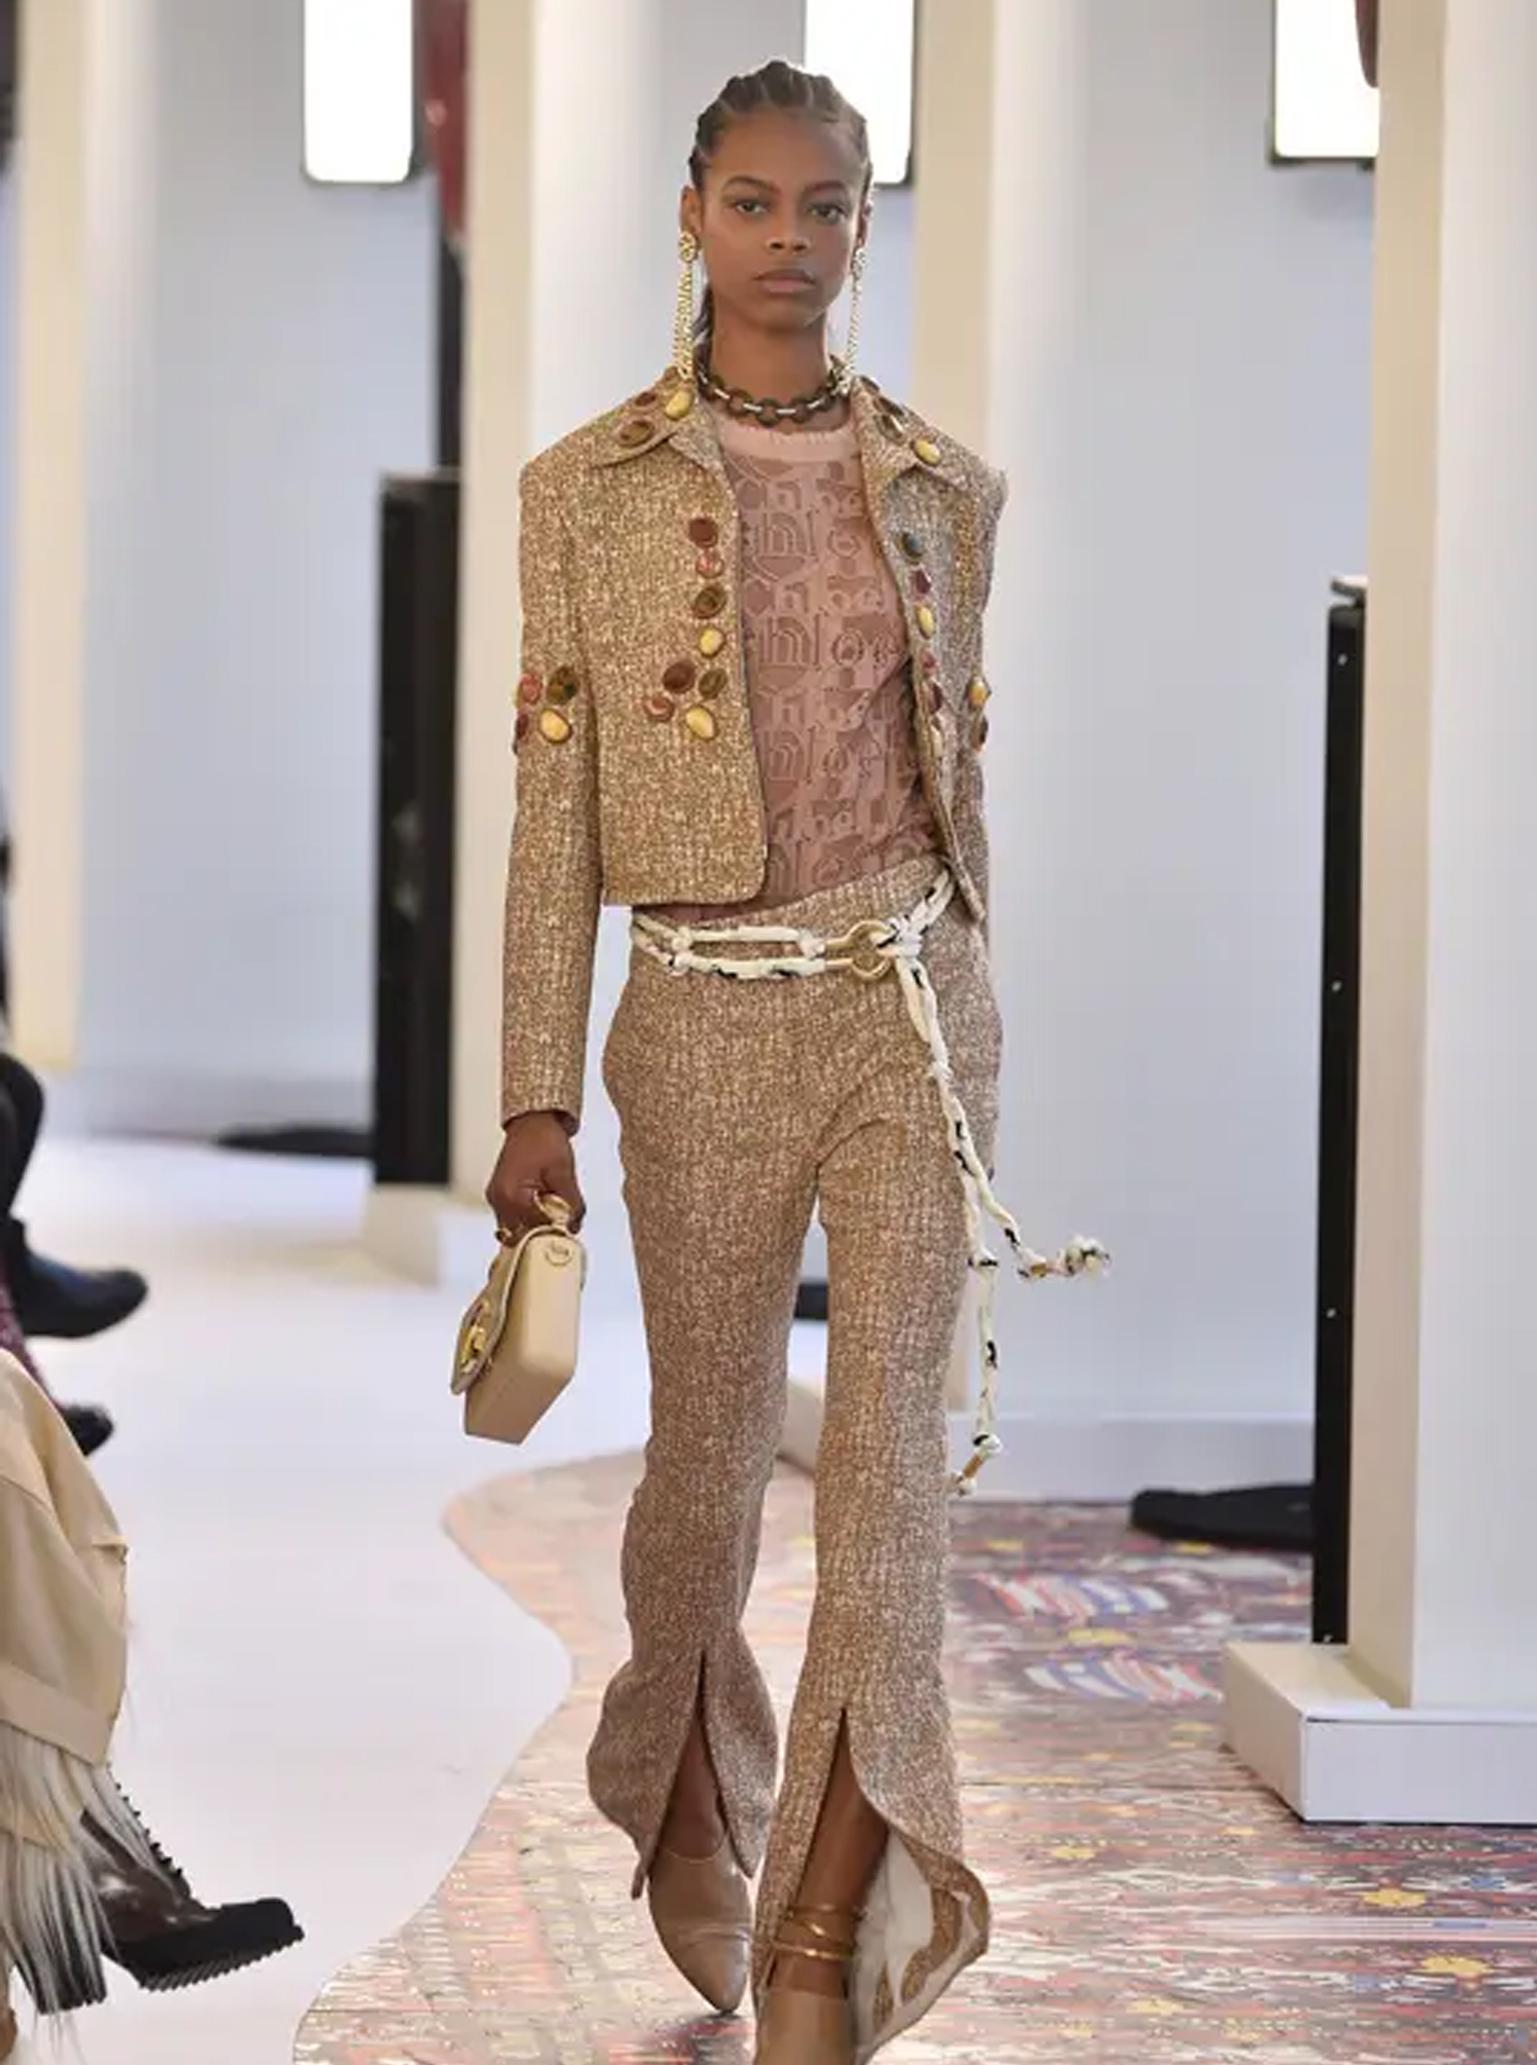 Paris Fashion Week Women's S/S 2019